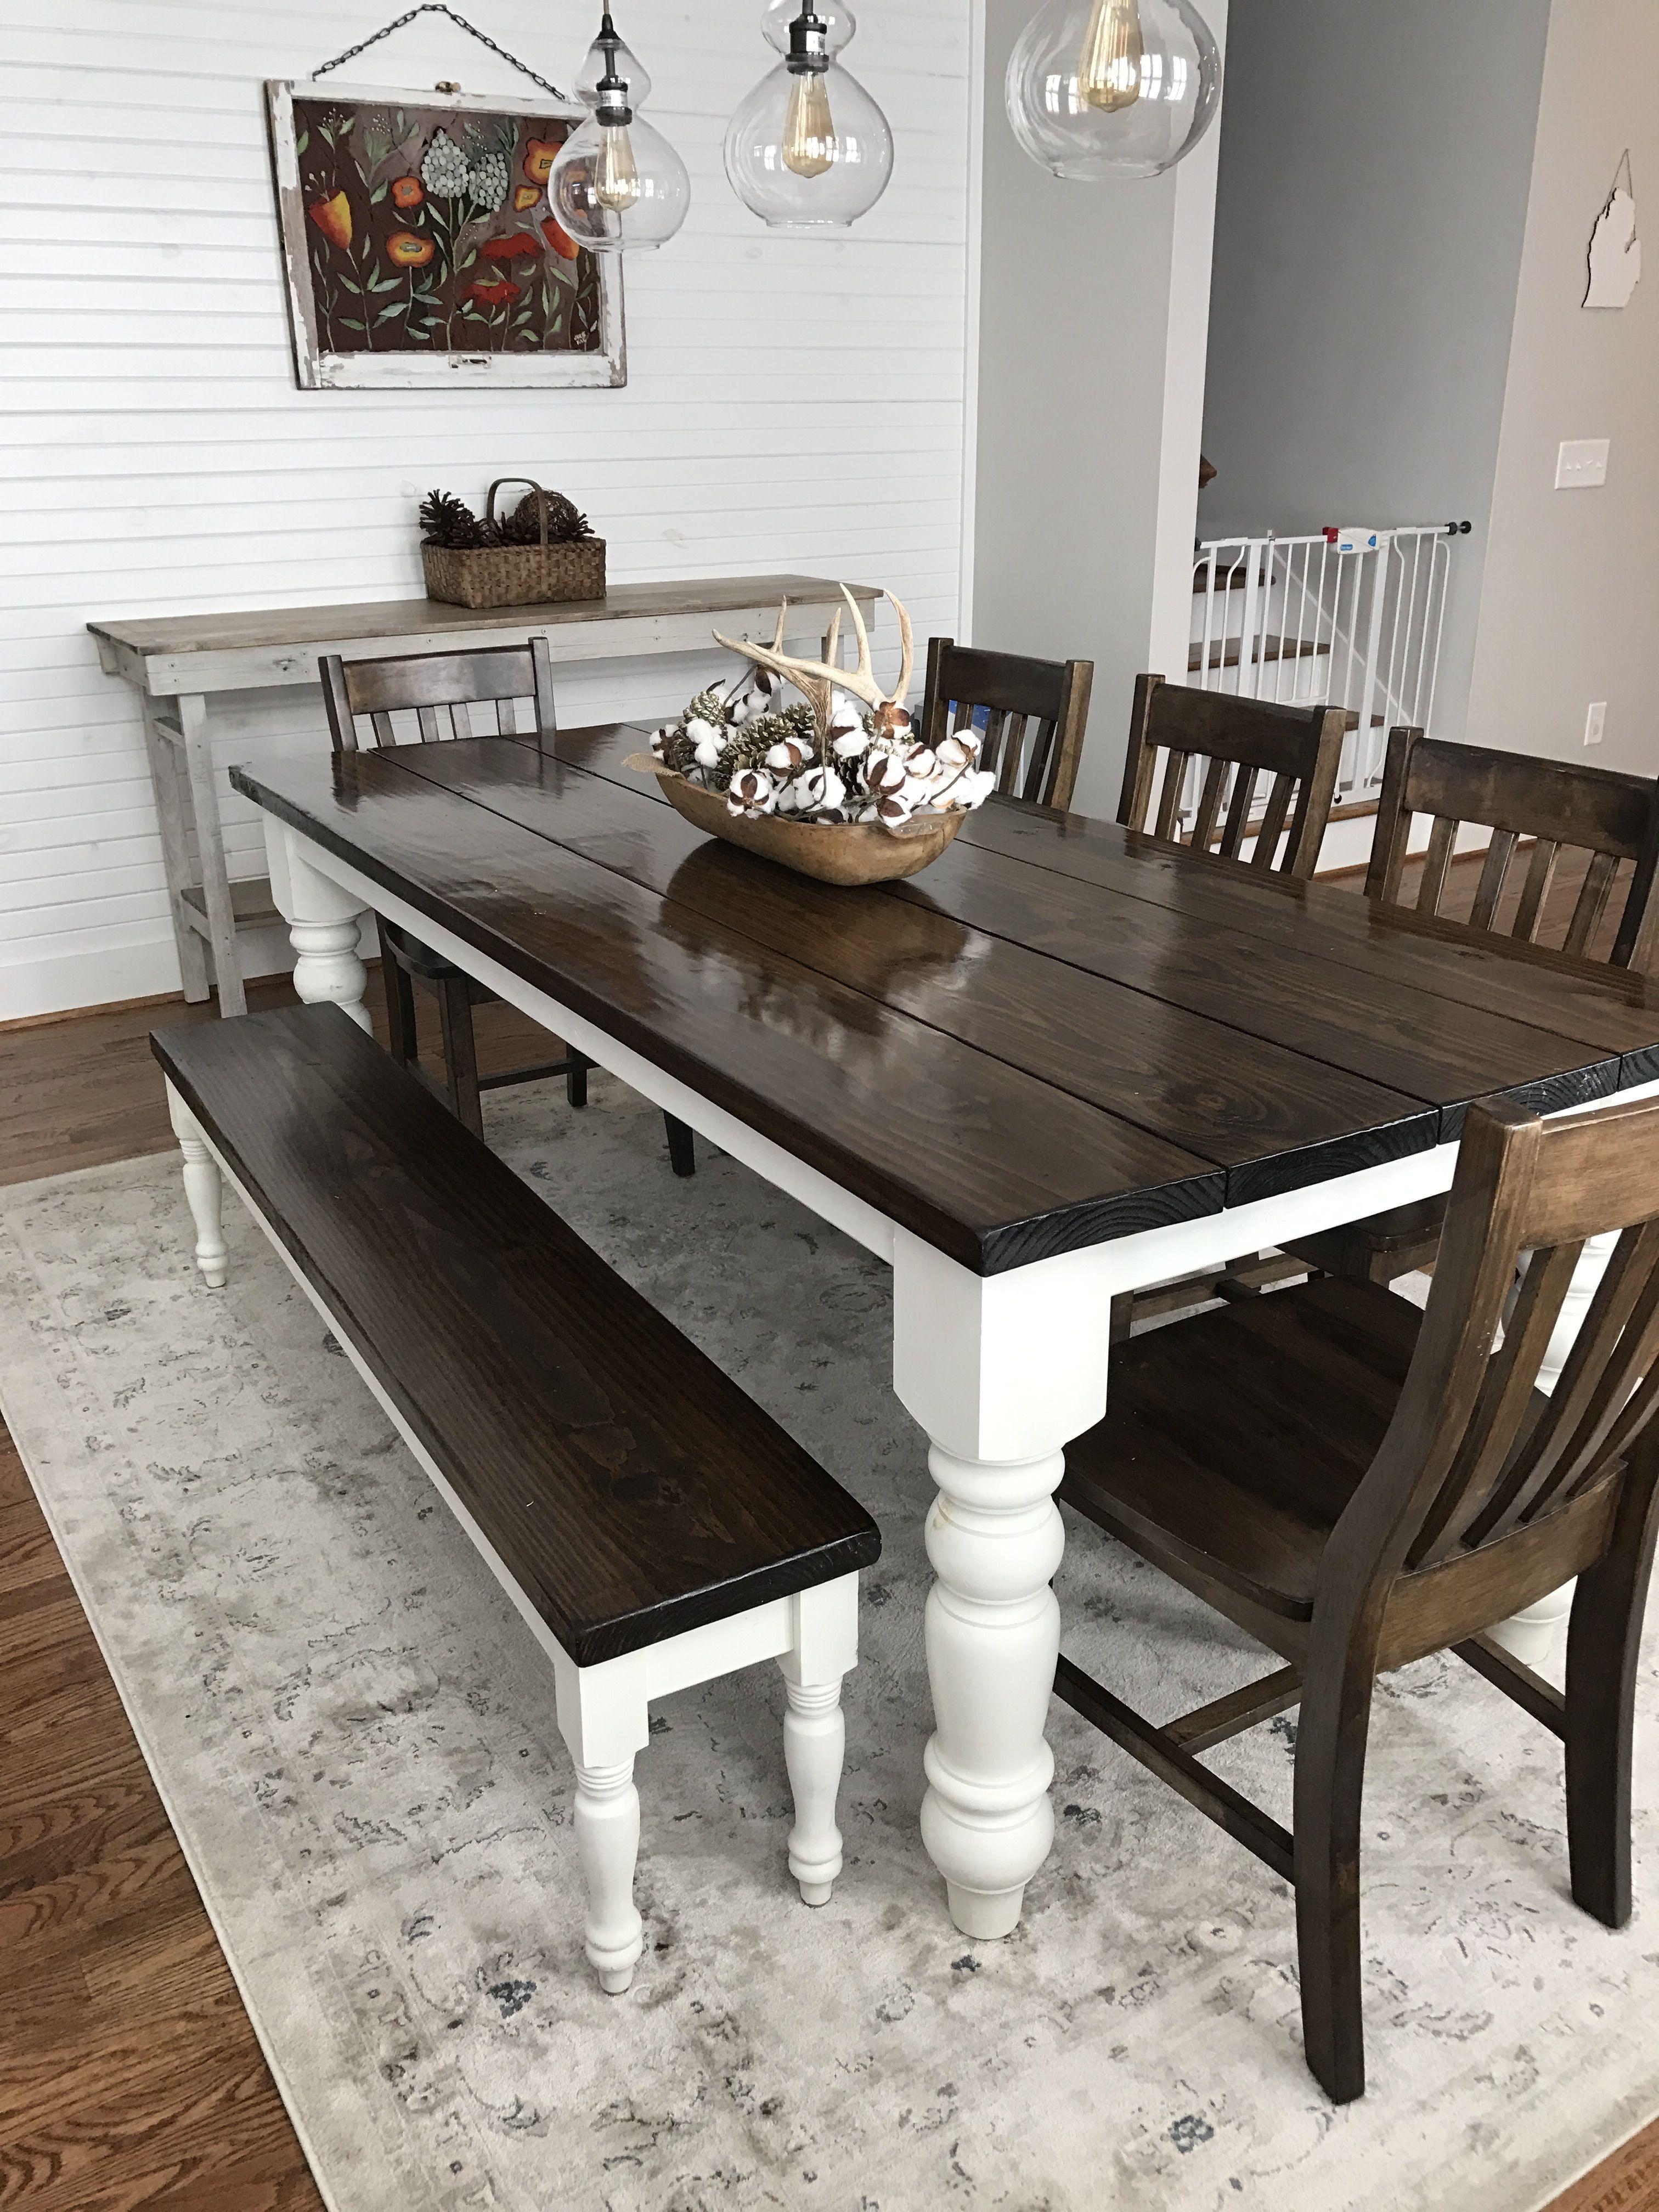 Badezimmer dekor tisch custom built solid wood modern farmhouse dining furniture u l x